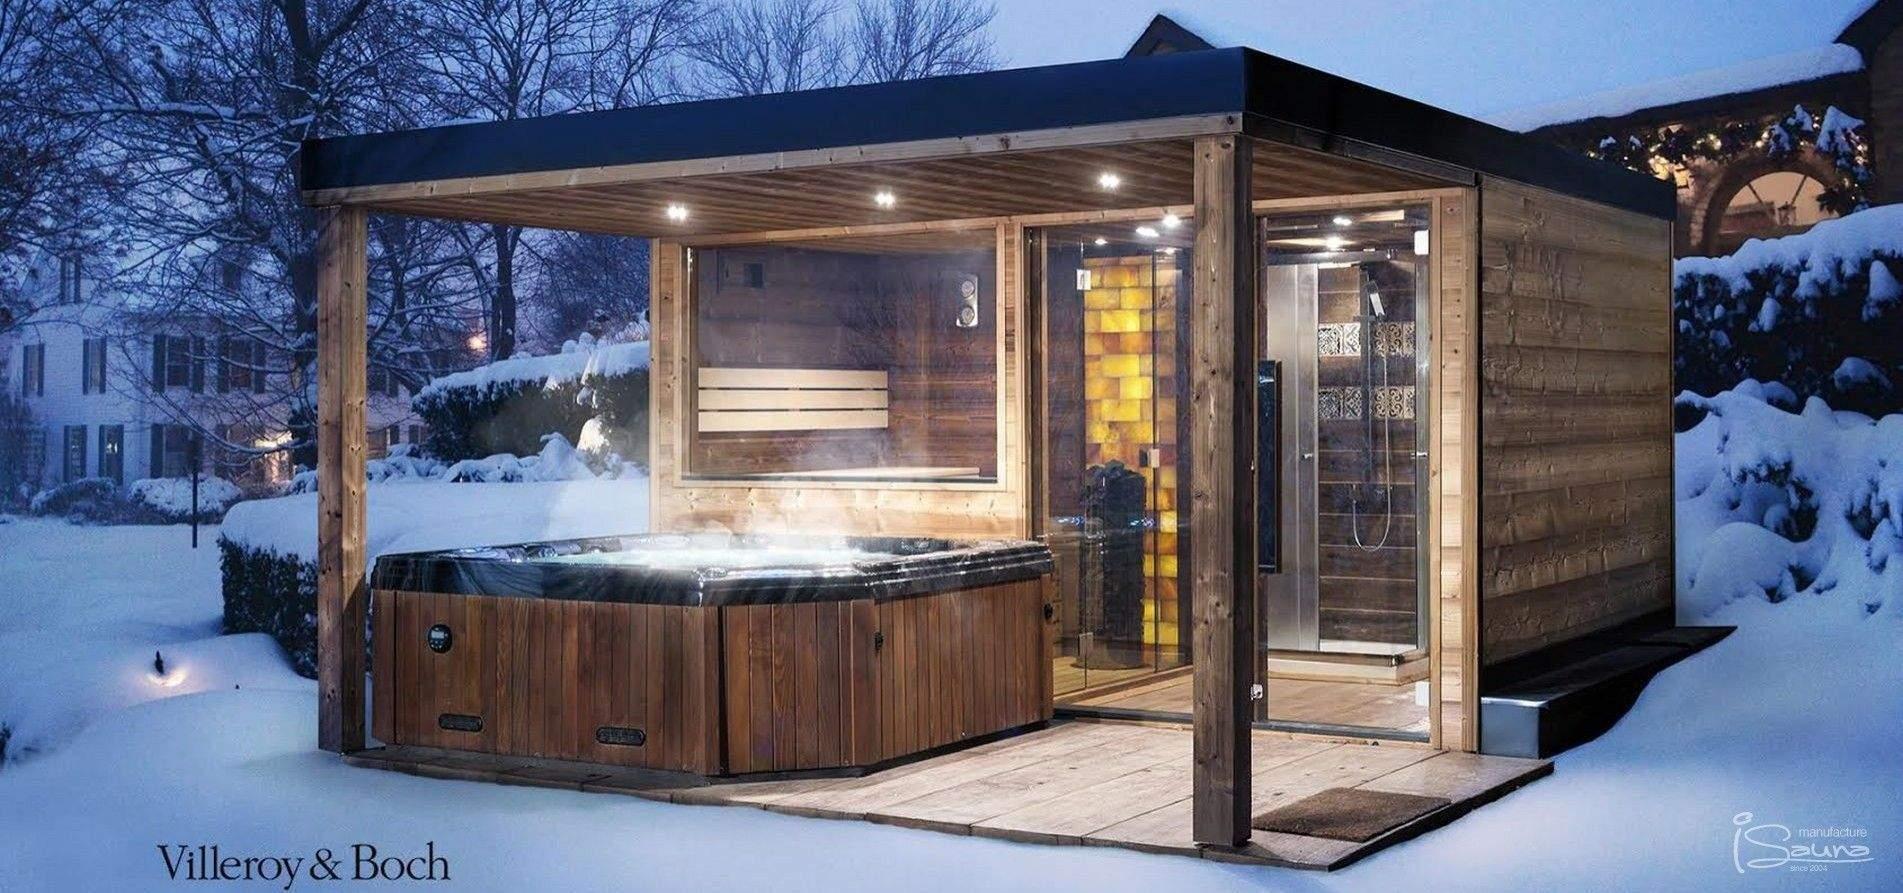 Sauna Selber Bauen Garten Frisch 32 Reizend Sauna Im Garten Neu Garten Anlegen